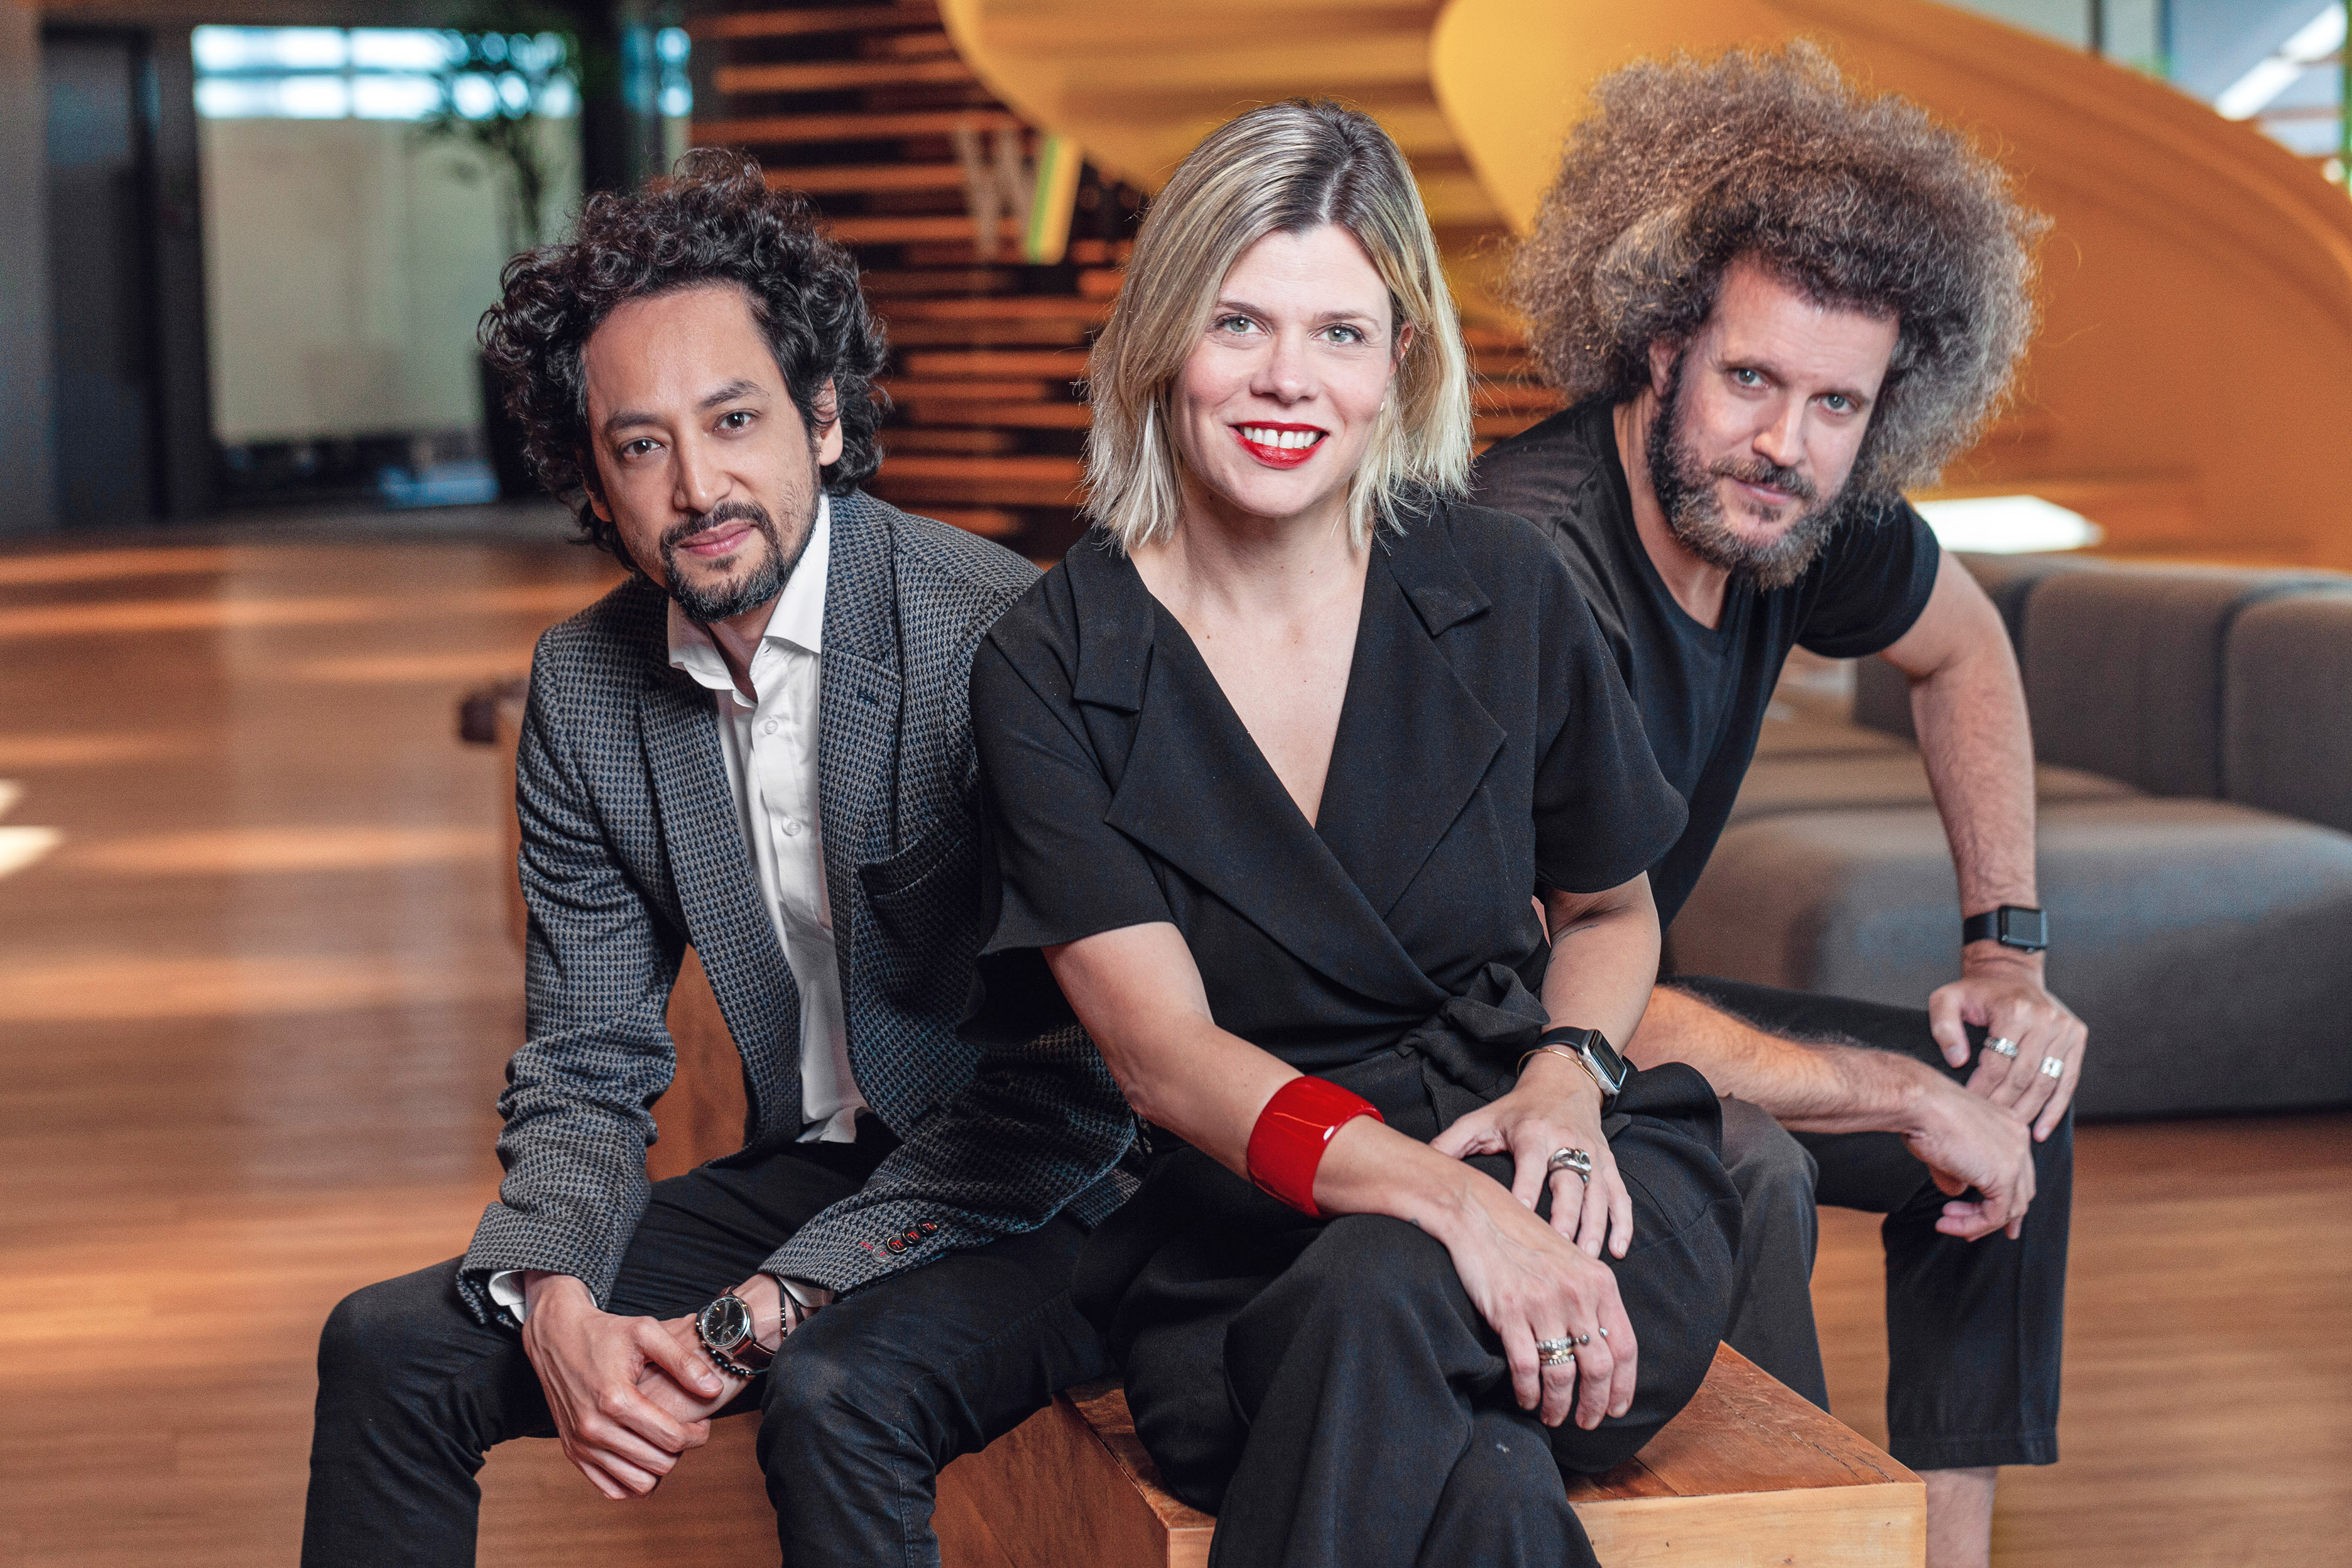 Kevin Zung, Renata Bokel e Hugo Rodrigues sentados juntos na recepção da WMcCann.